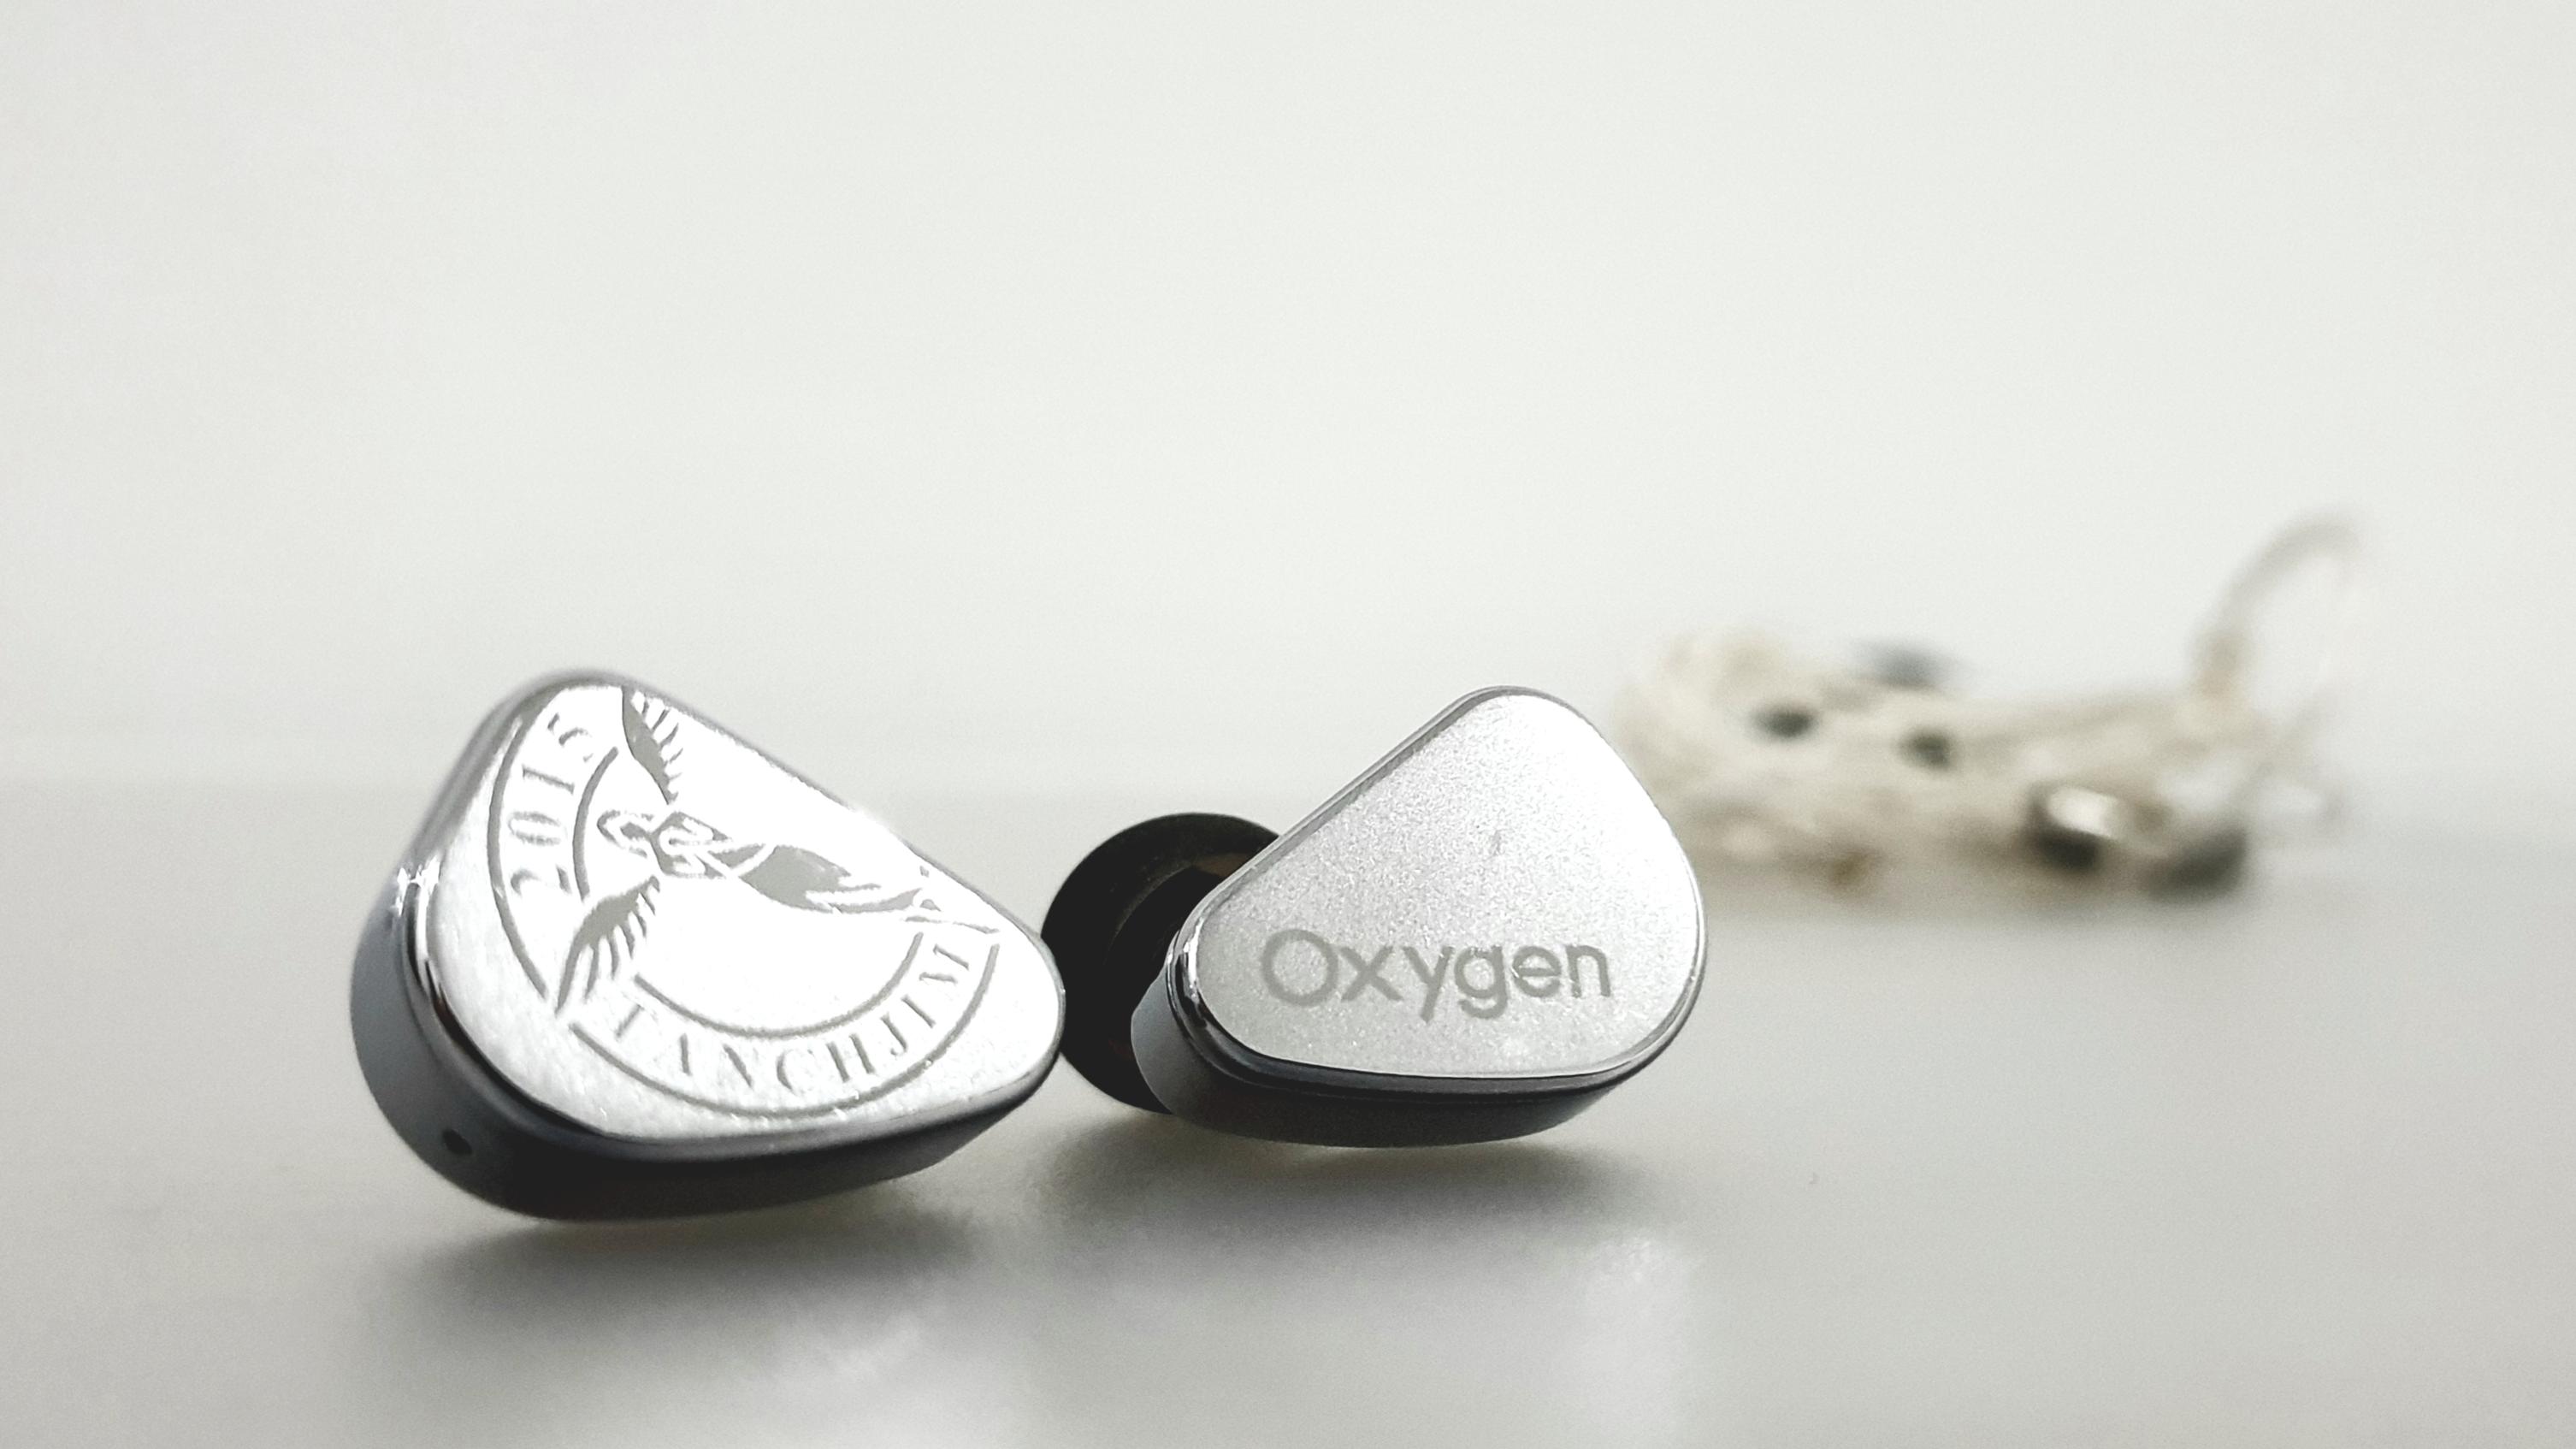 Oxygen-01.jpg